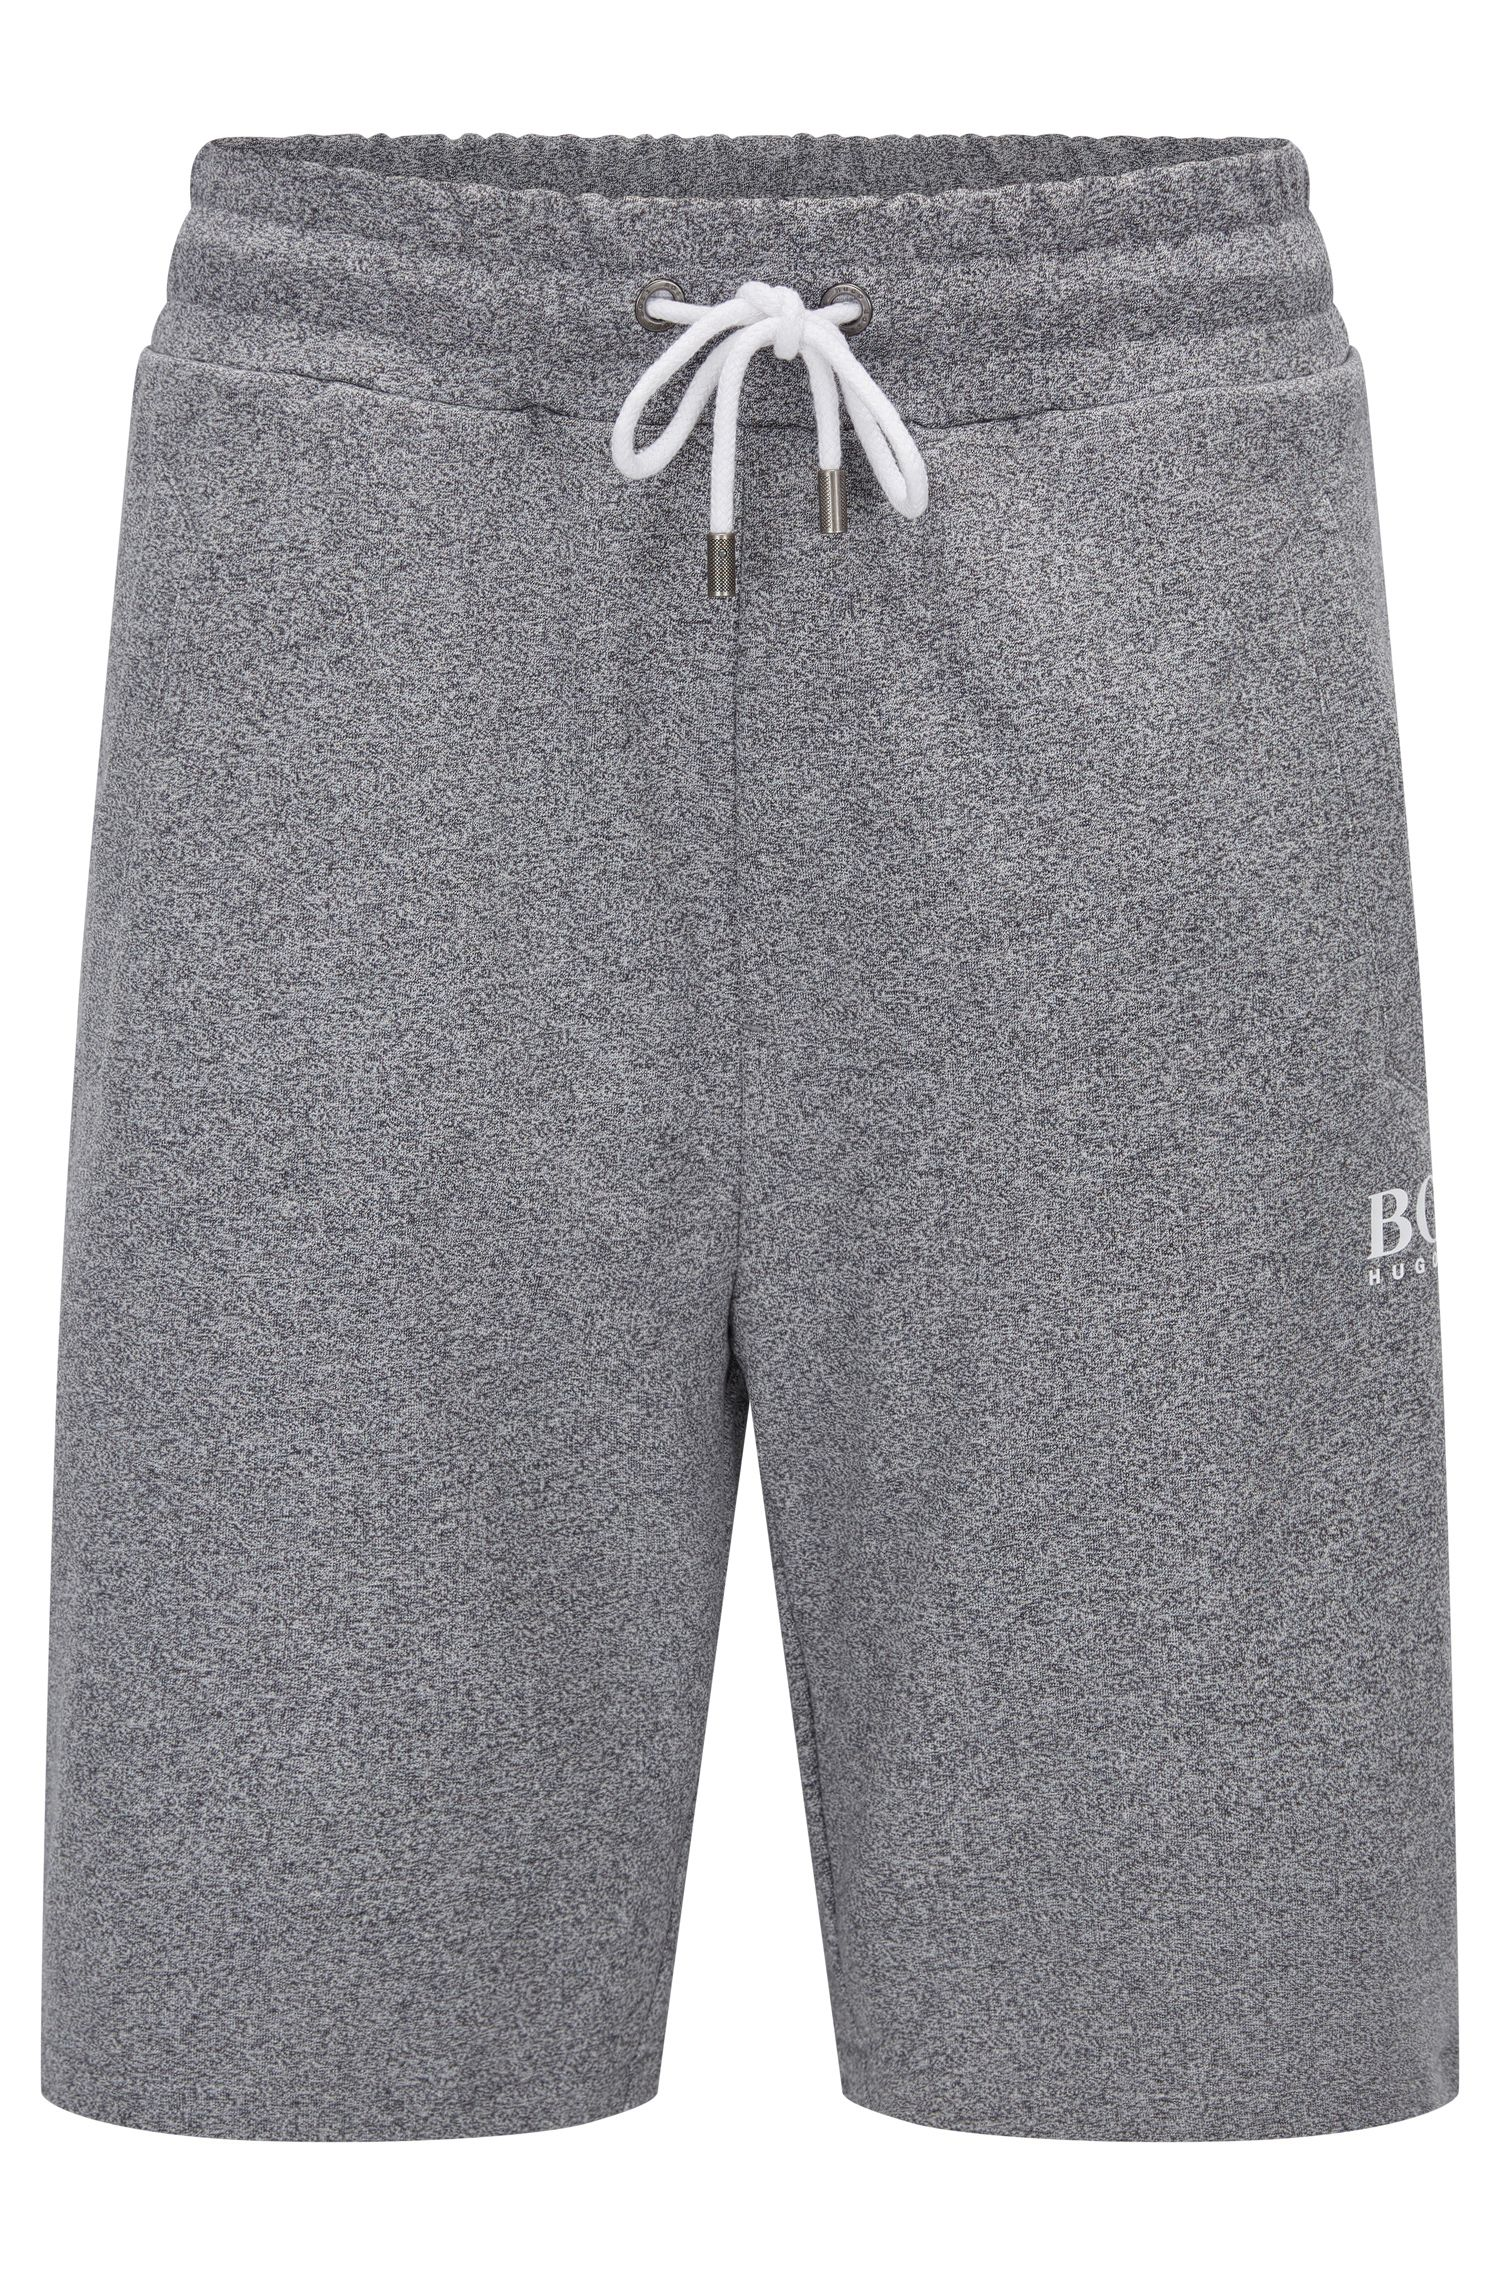 Heathered Cotton Sweatshort | Short Pant, Charcoal